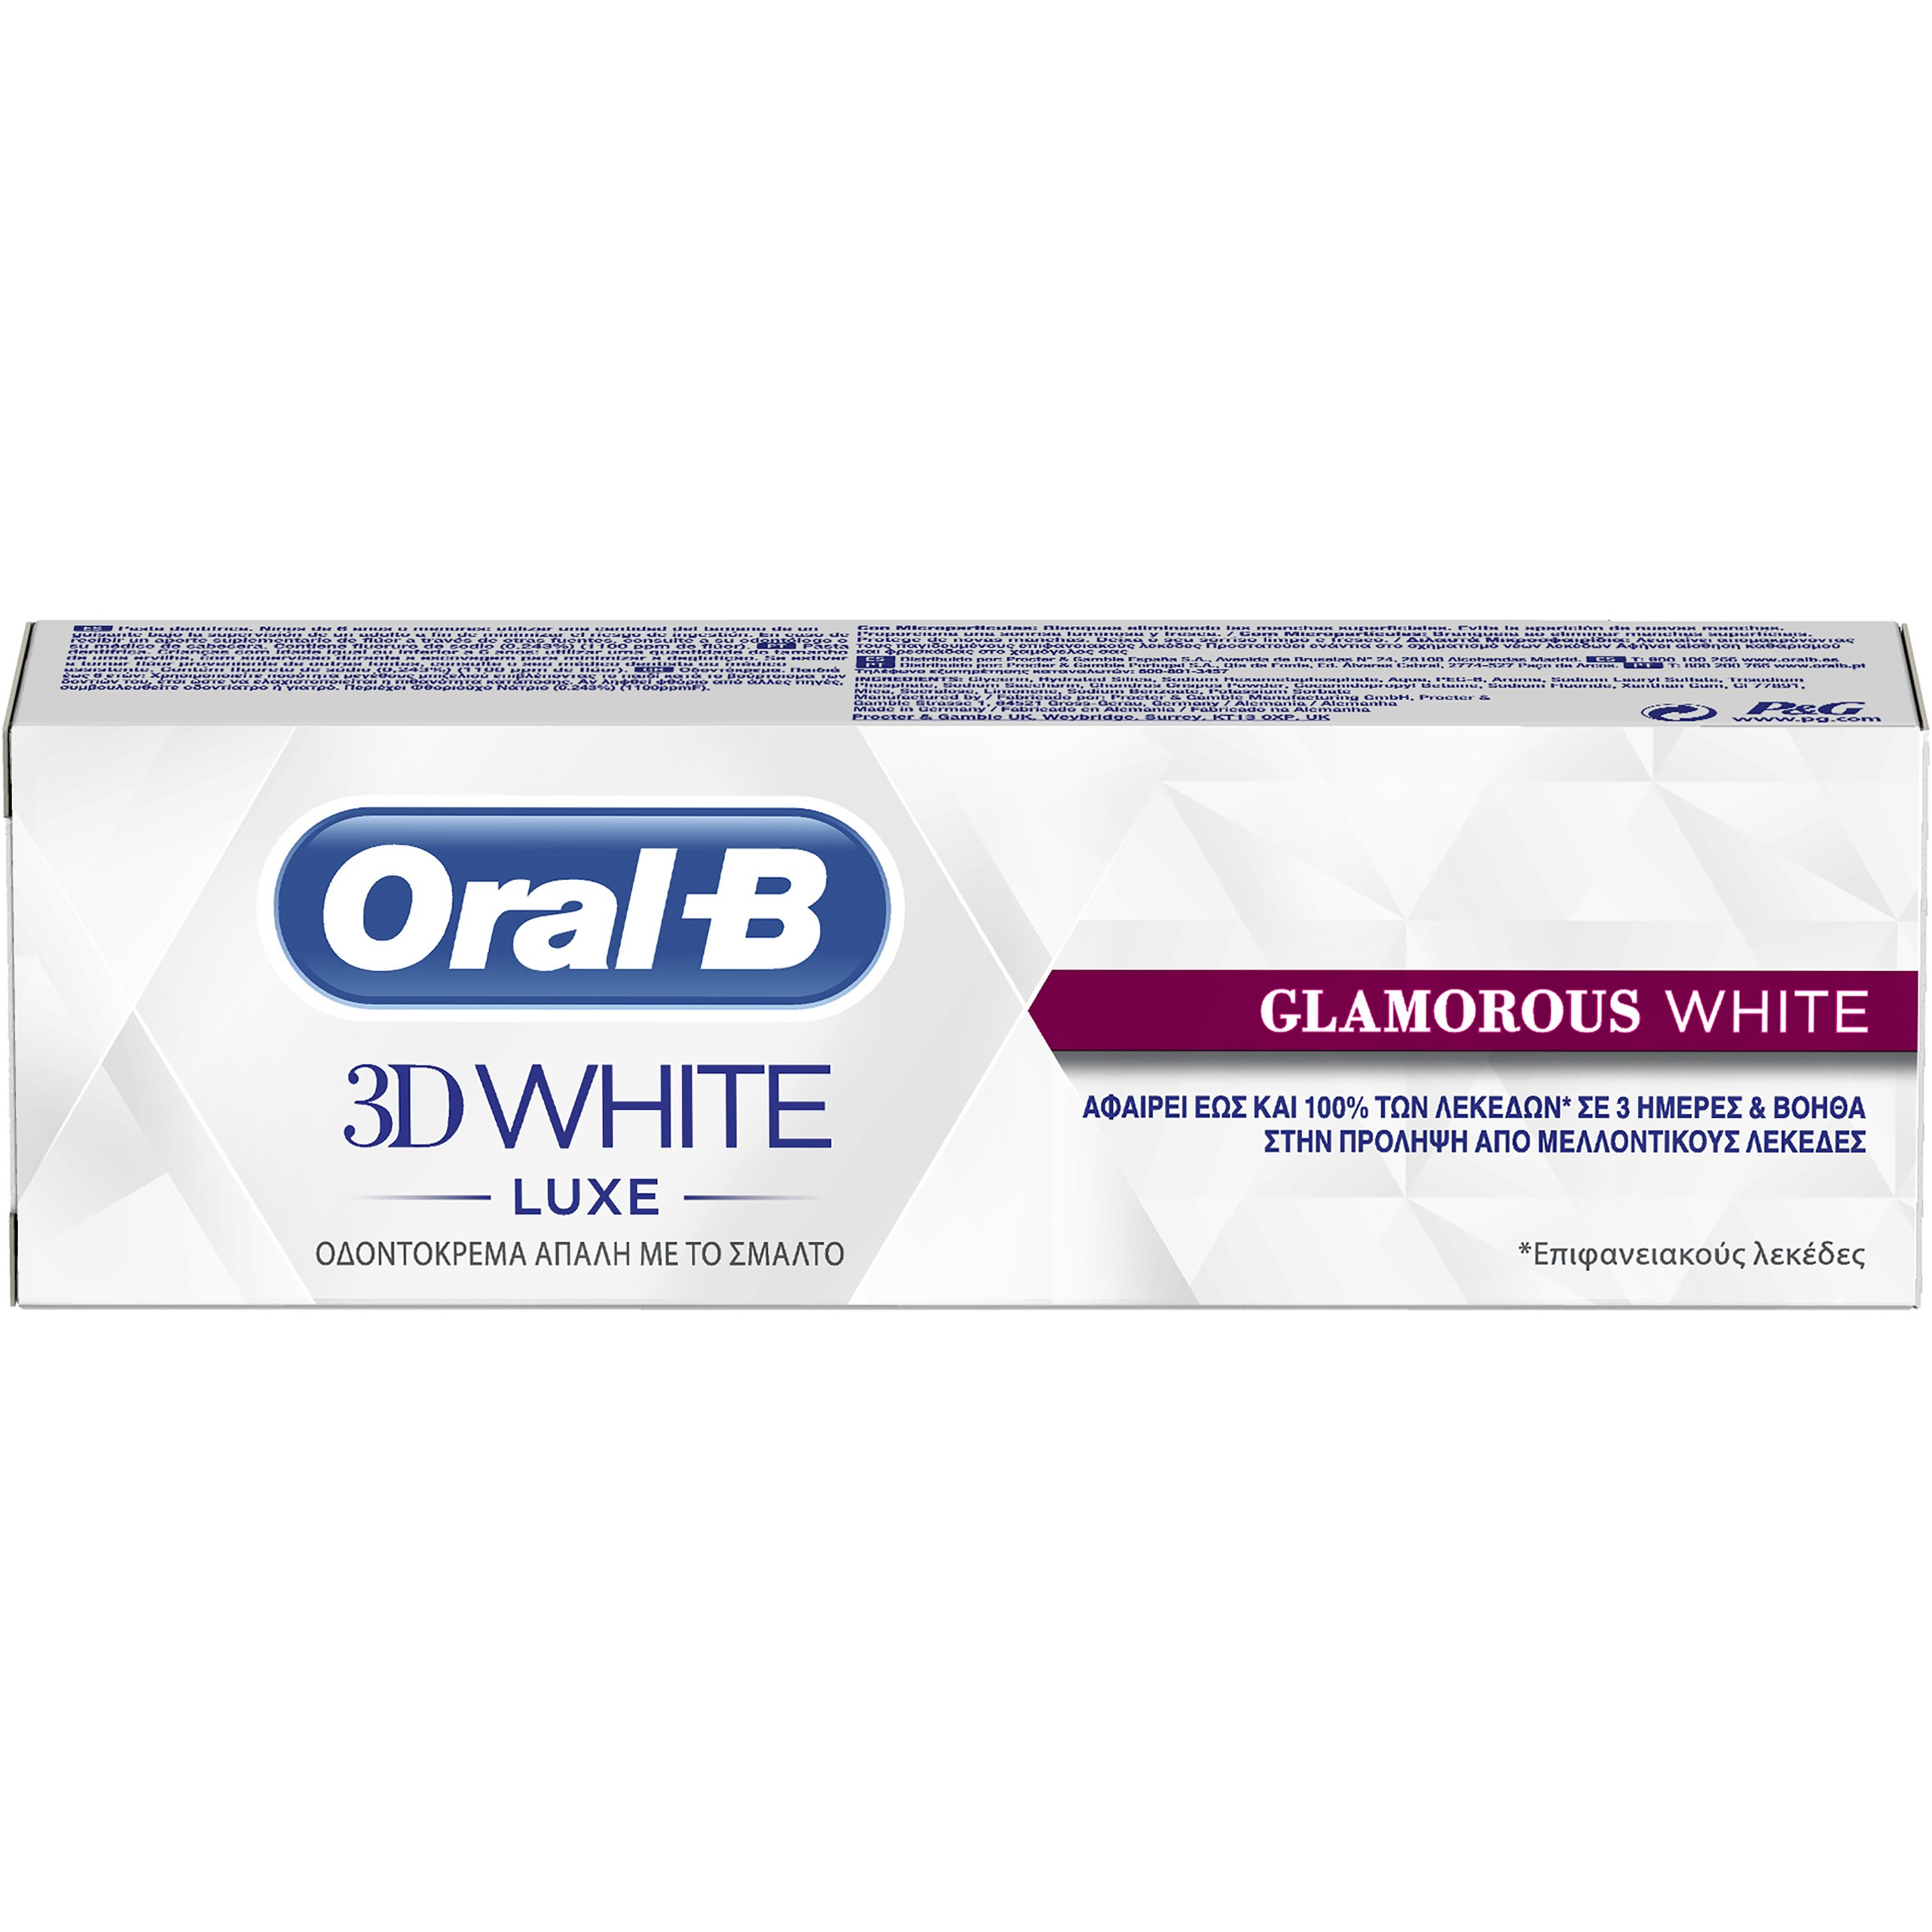 Oral-B 3D White Luxe Glamorous White Οδοντόκρεμα για Αφαίρεση Έως και 90% των Λεκέδων από την Επιφάνεια της Οδοντοστοιχίας 75ml